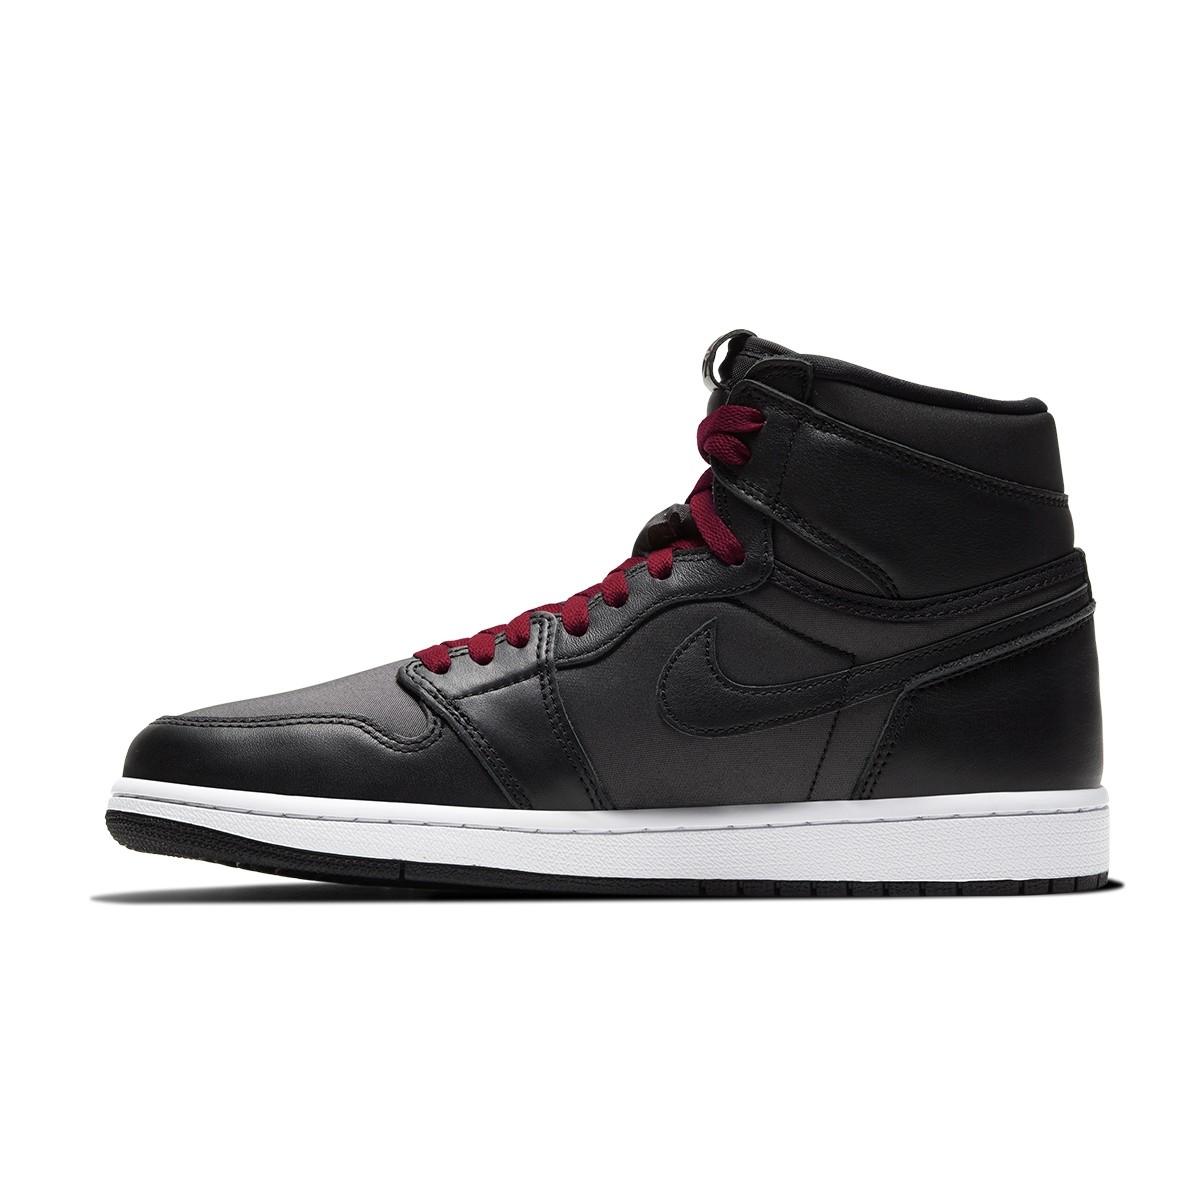 Air Jordan 1 Retro HI OG Jr 'Black/Gym Red'-575441-060